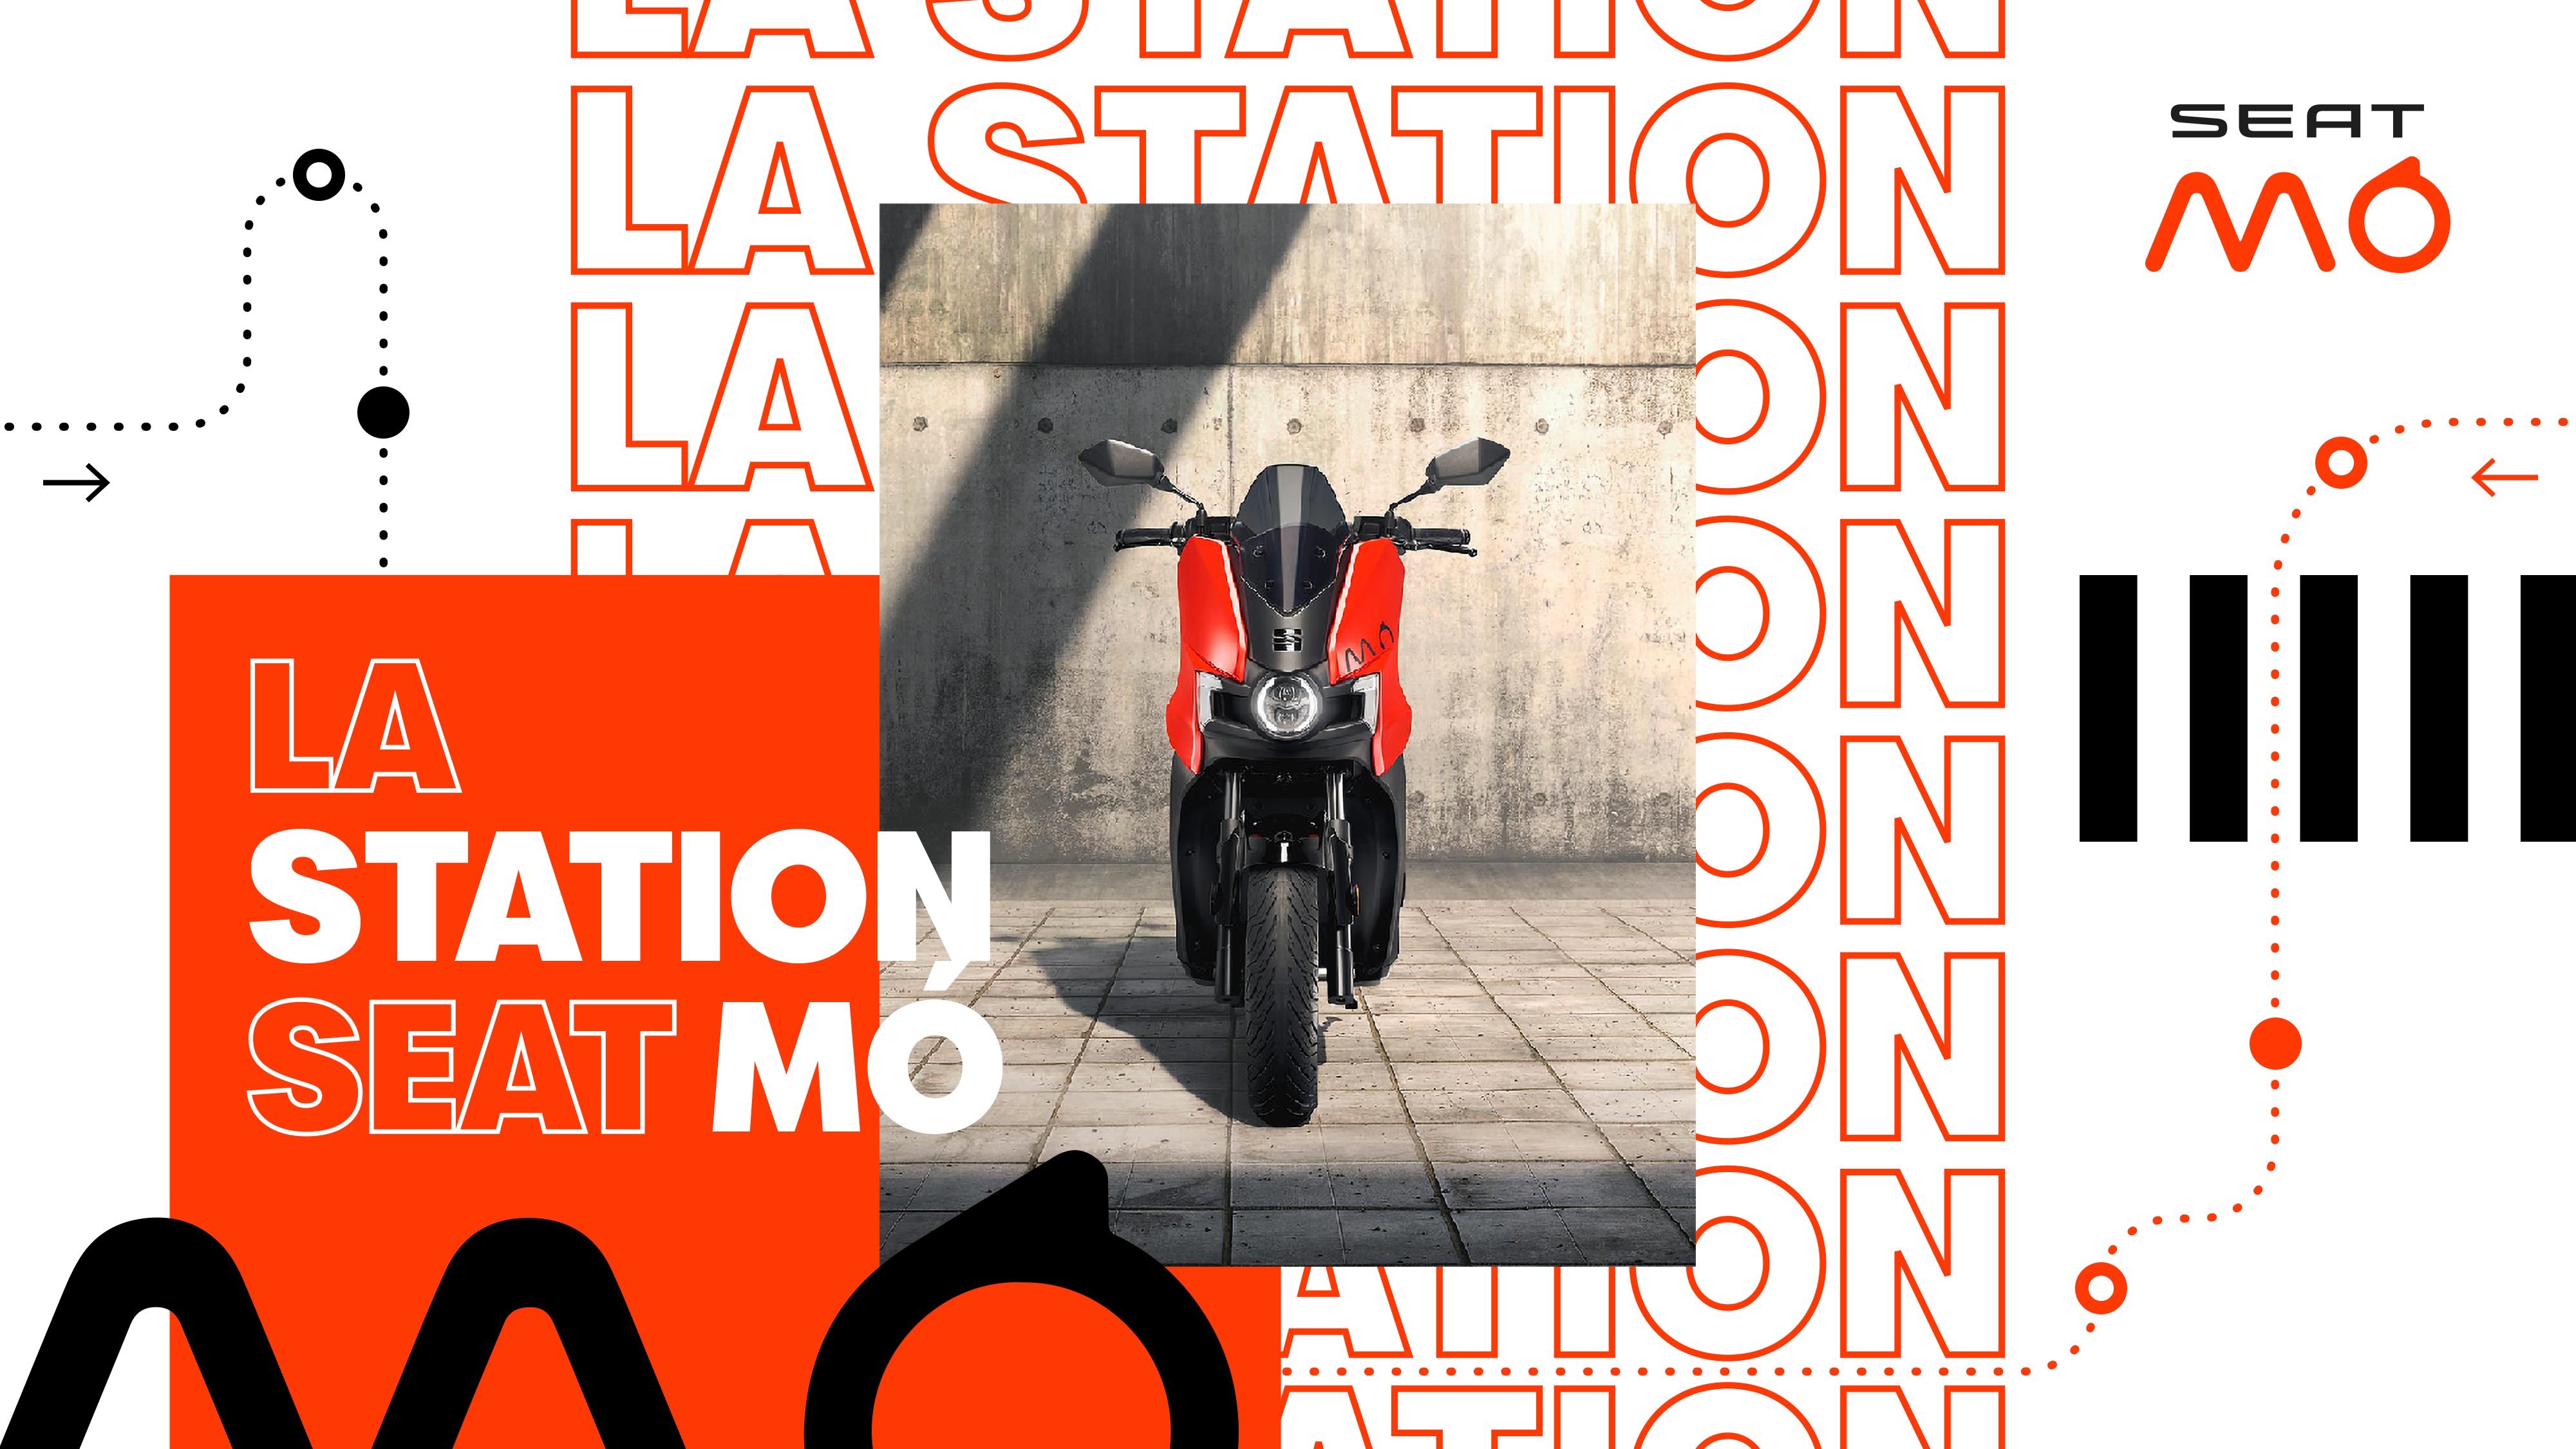 KV_STATION_SEAT_MO_NEW_B